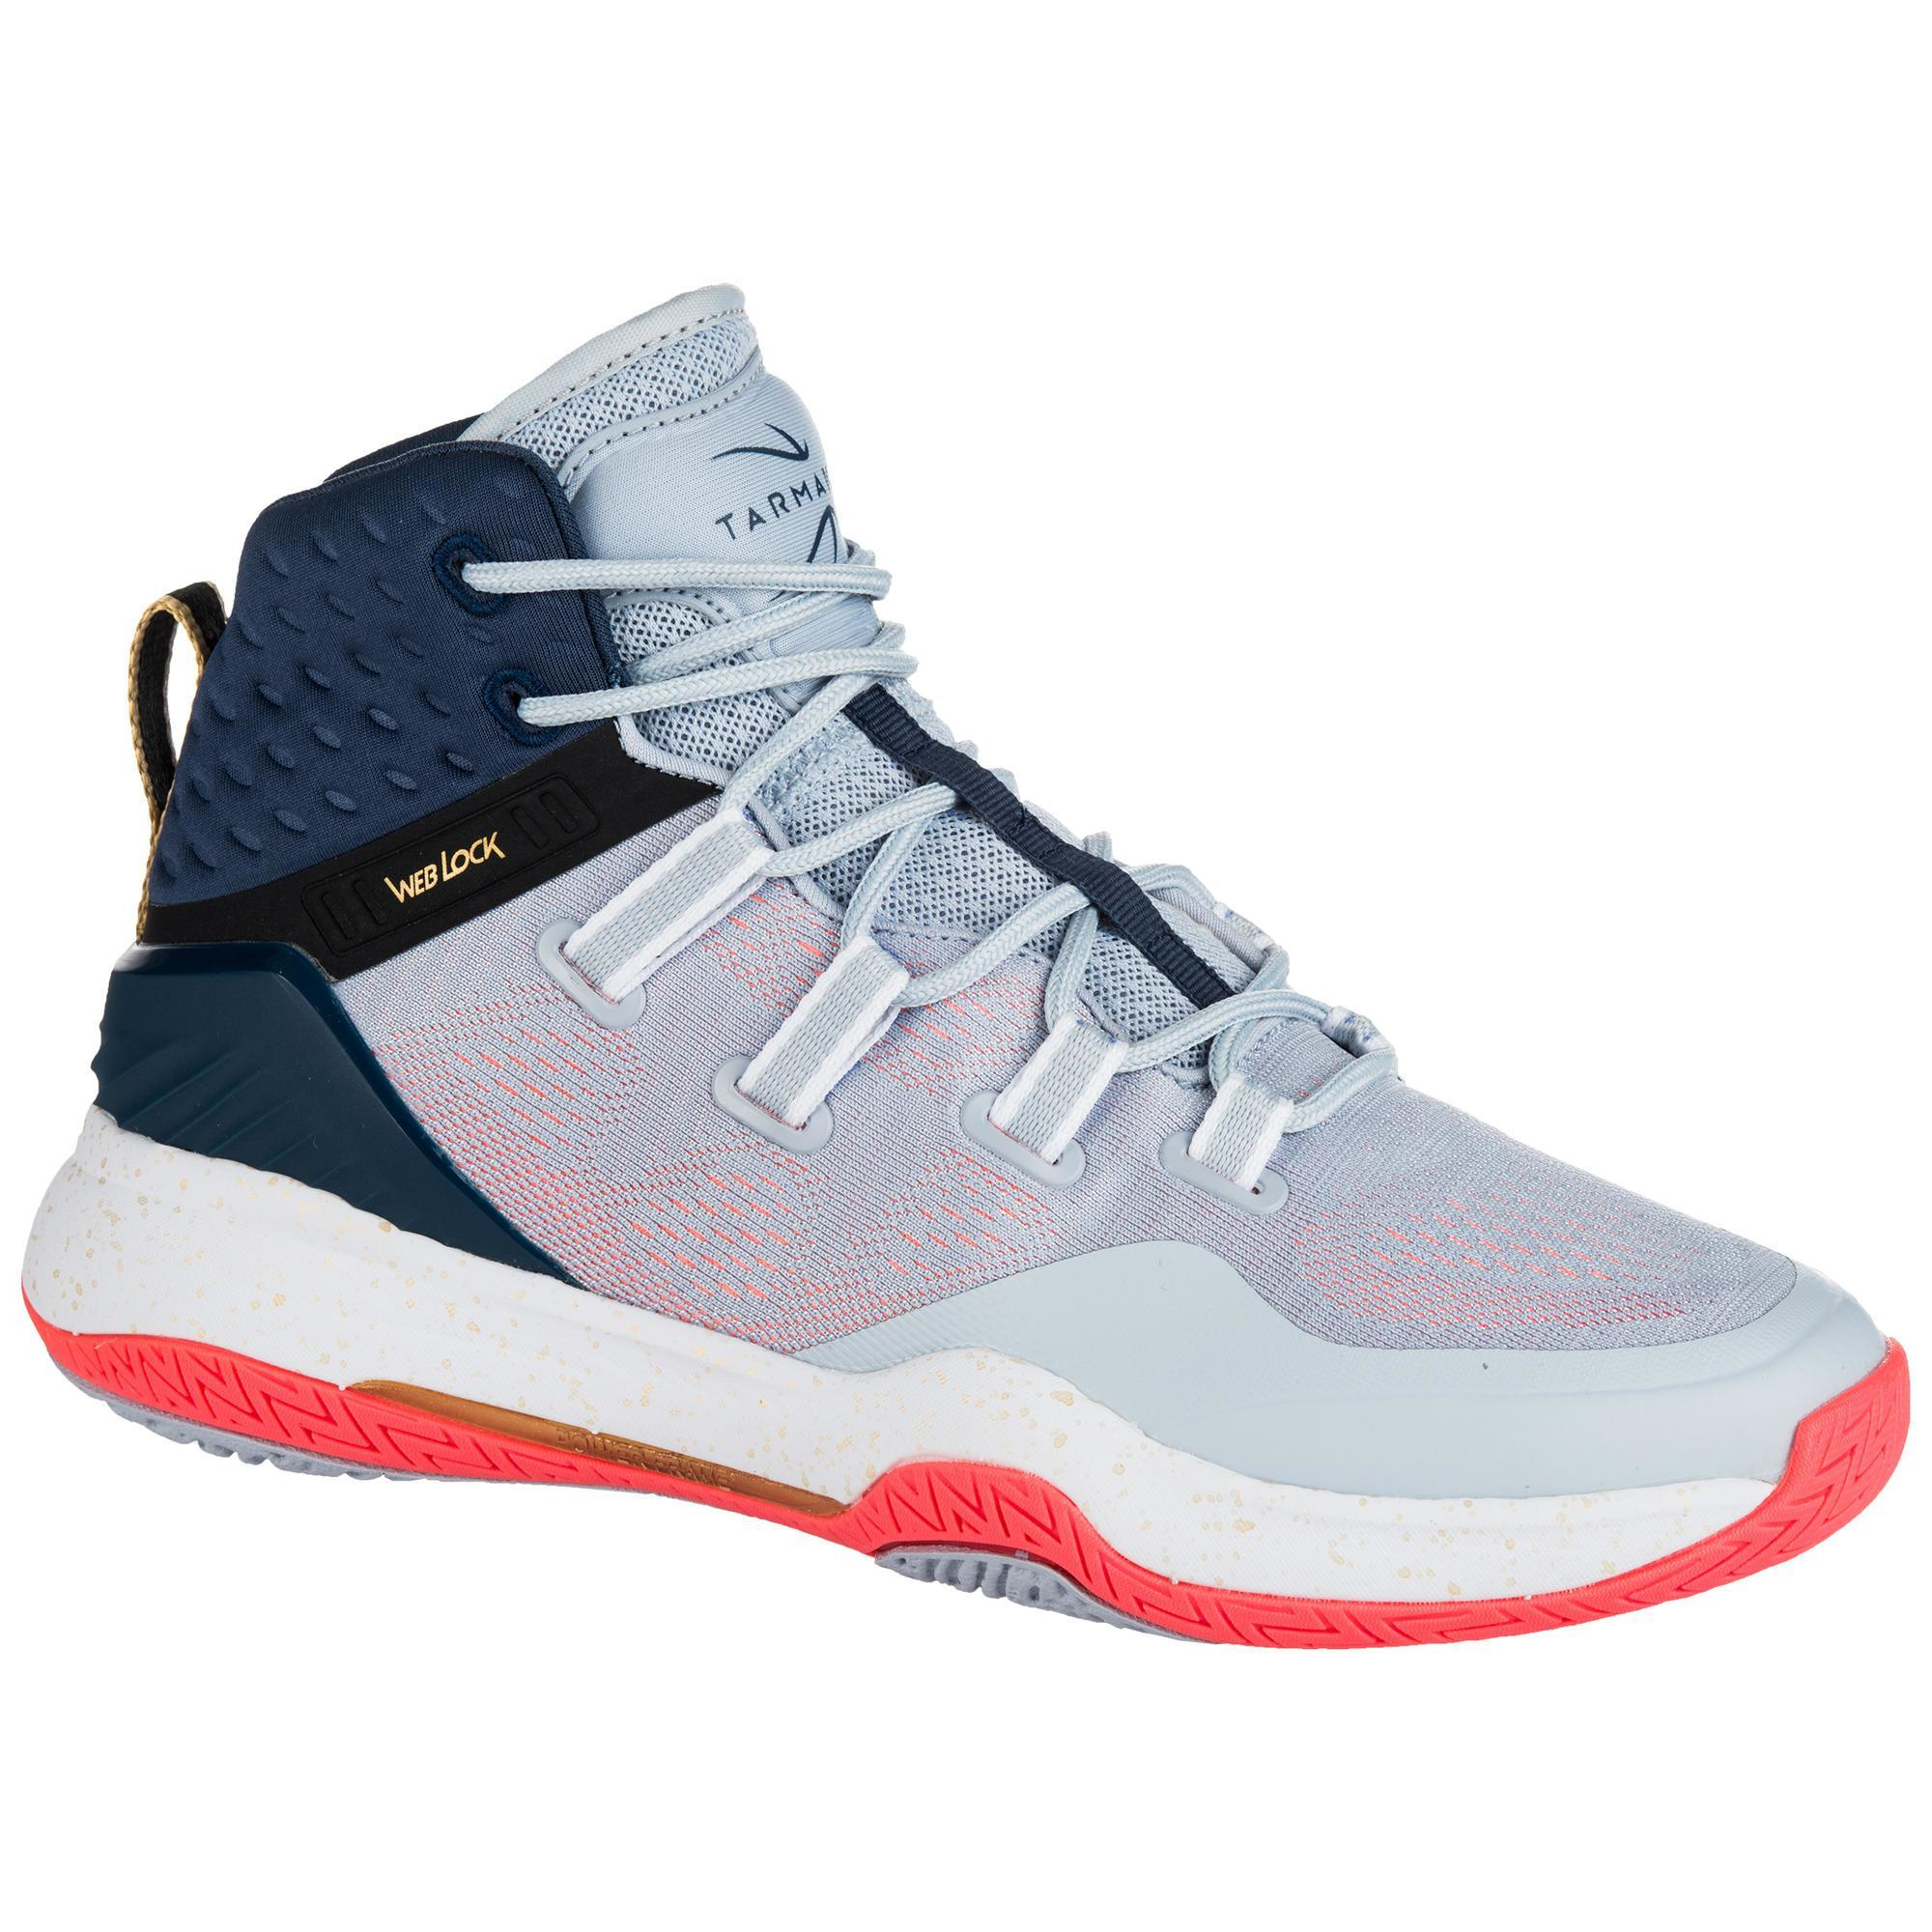 super popular c0723 62677 Chaussures femme par sport   Decathlon